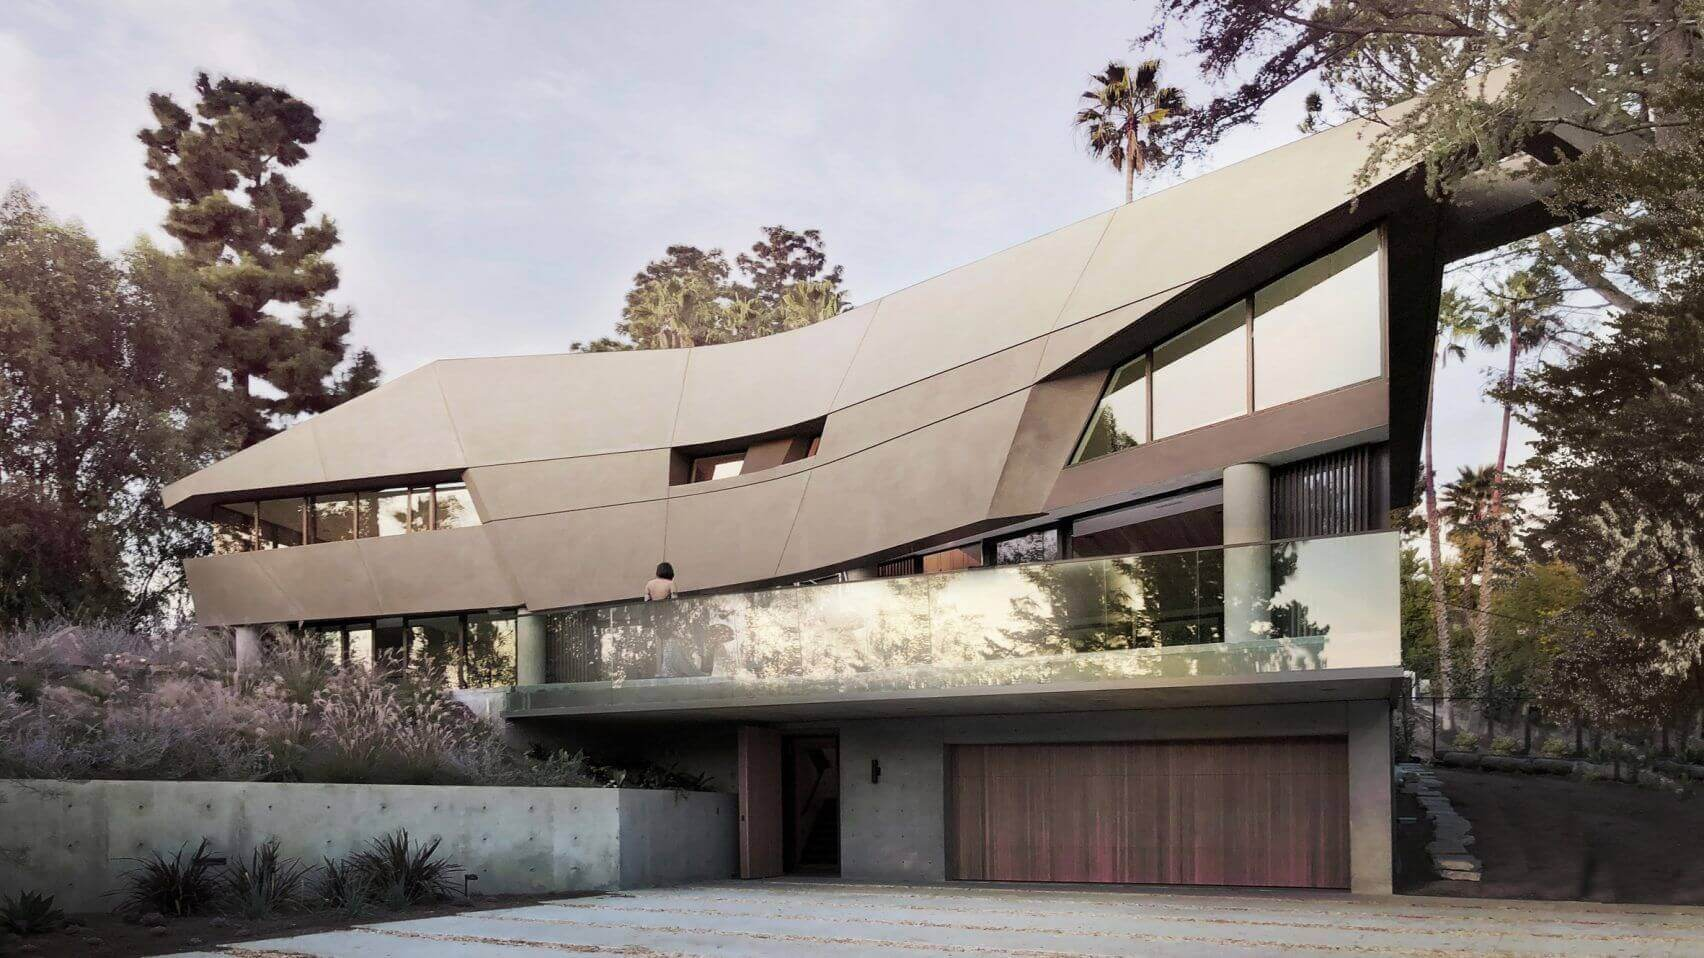 Huis ontwerp van architect patrick tighe